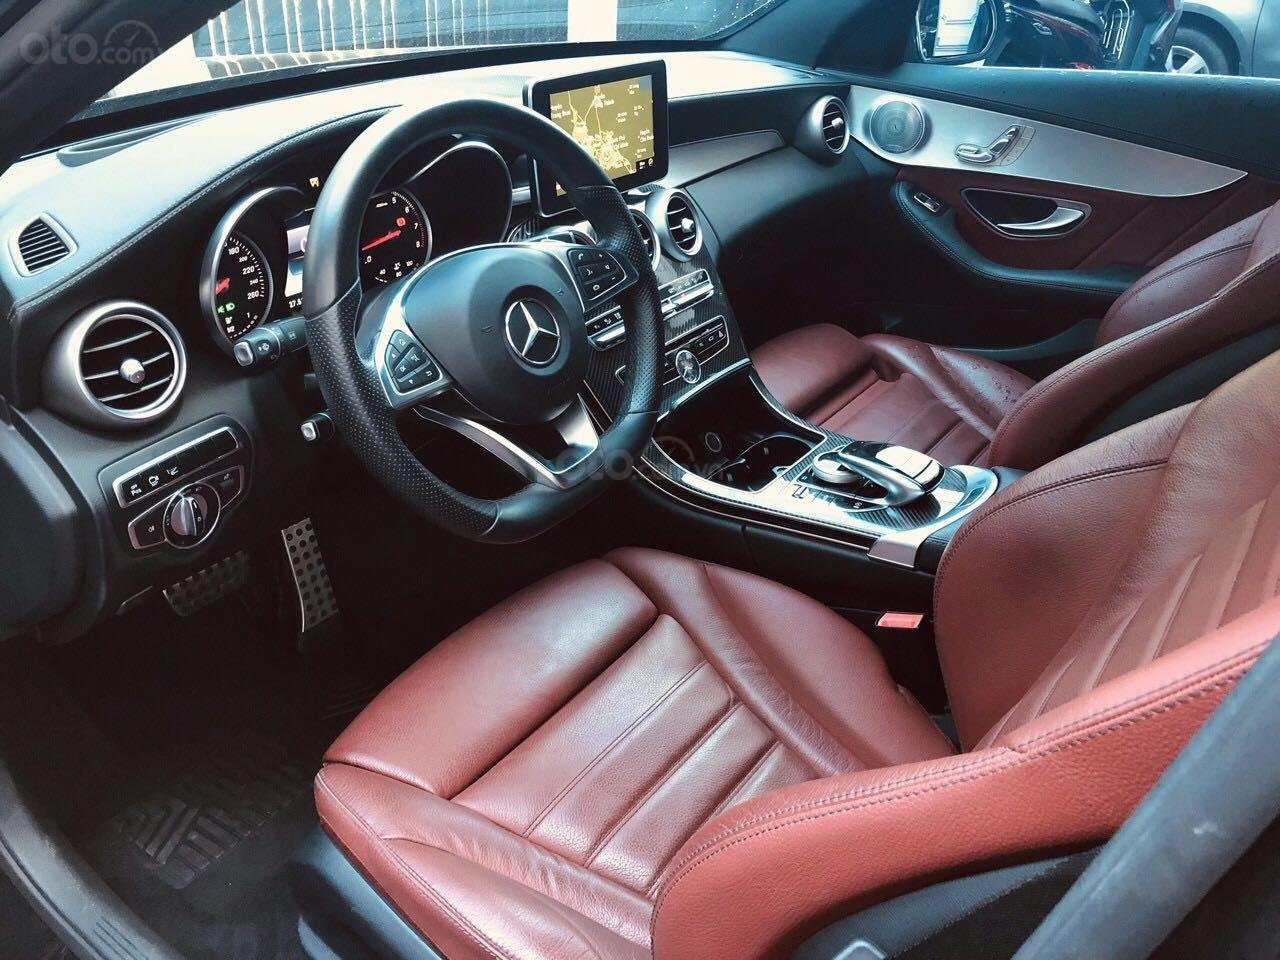 Bán Mercedes C300 AMG 2016 35.000km (8)